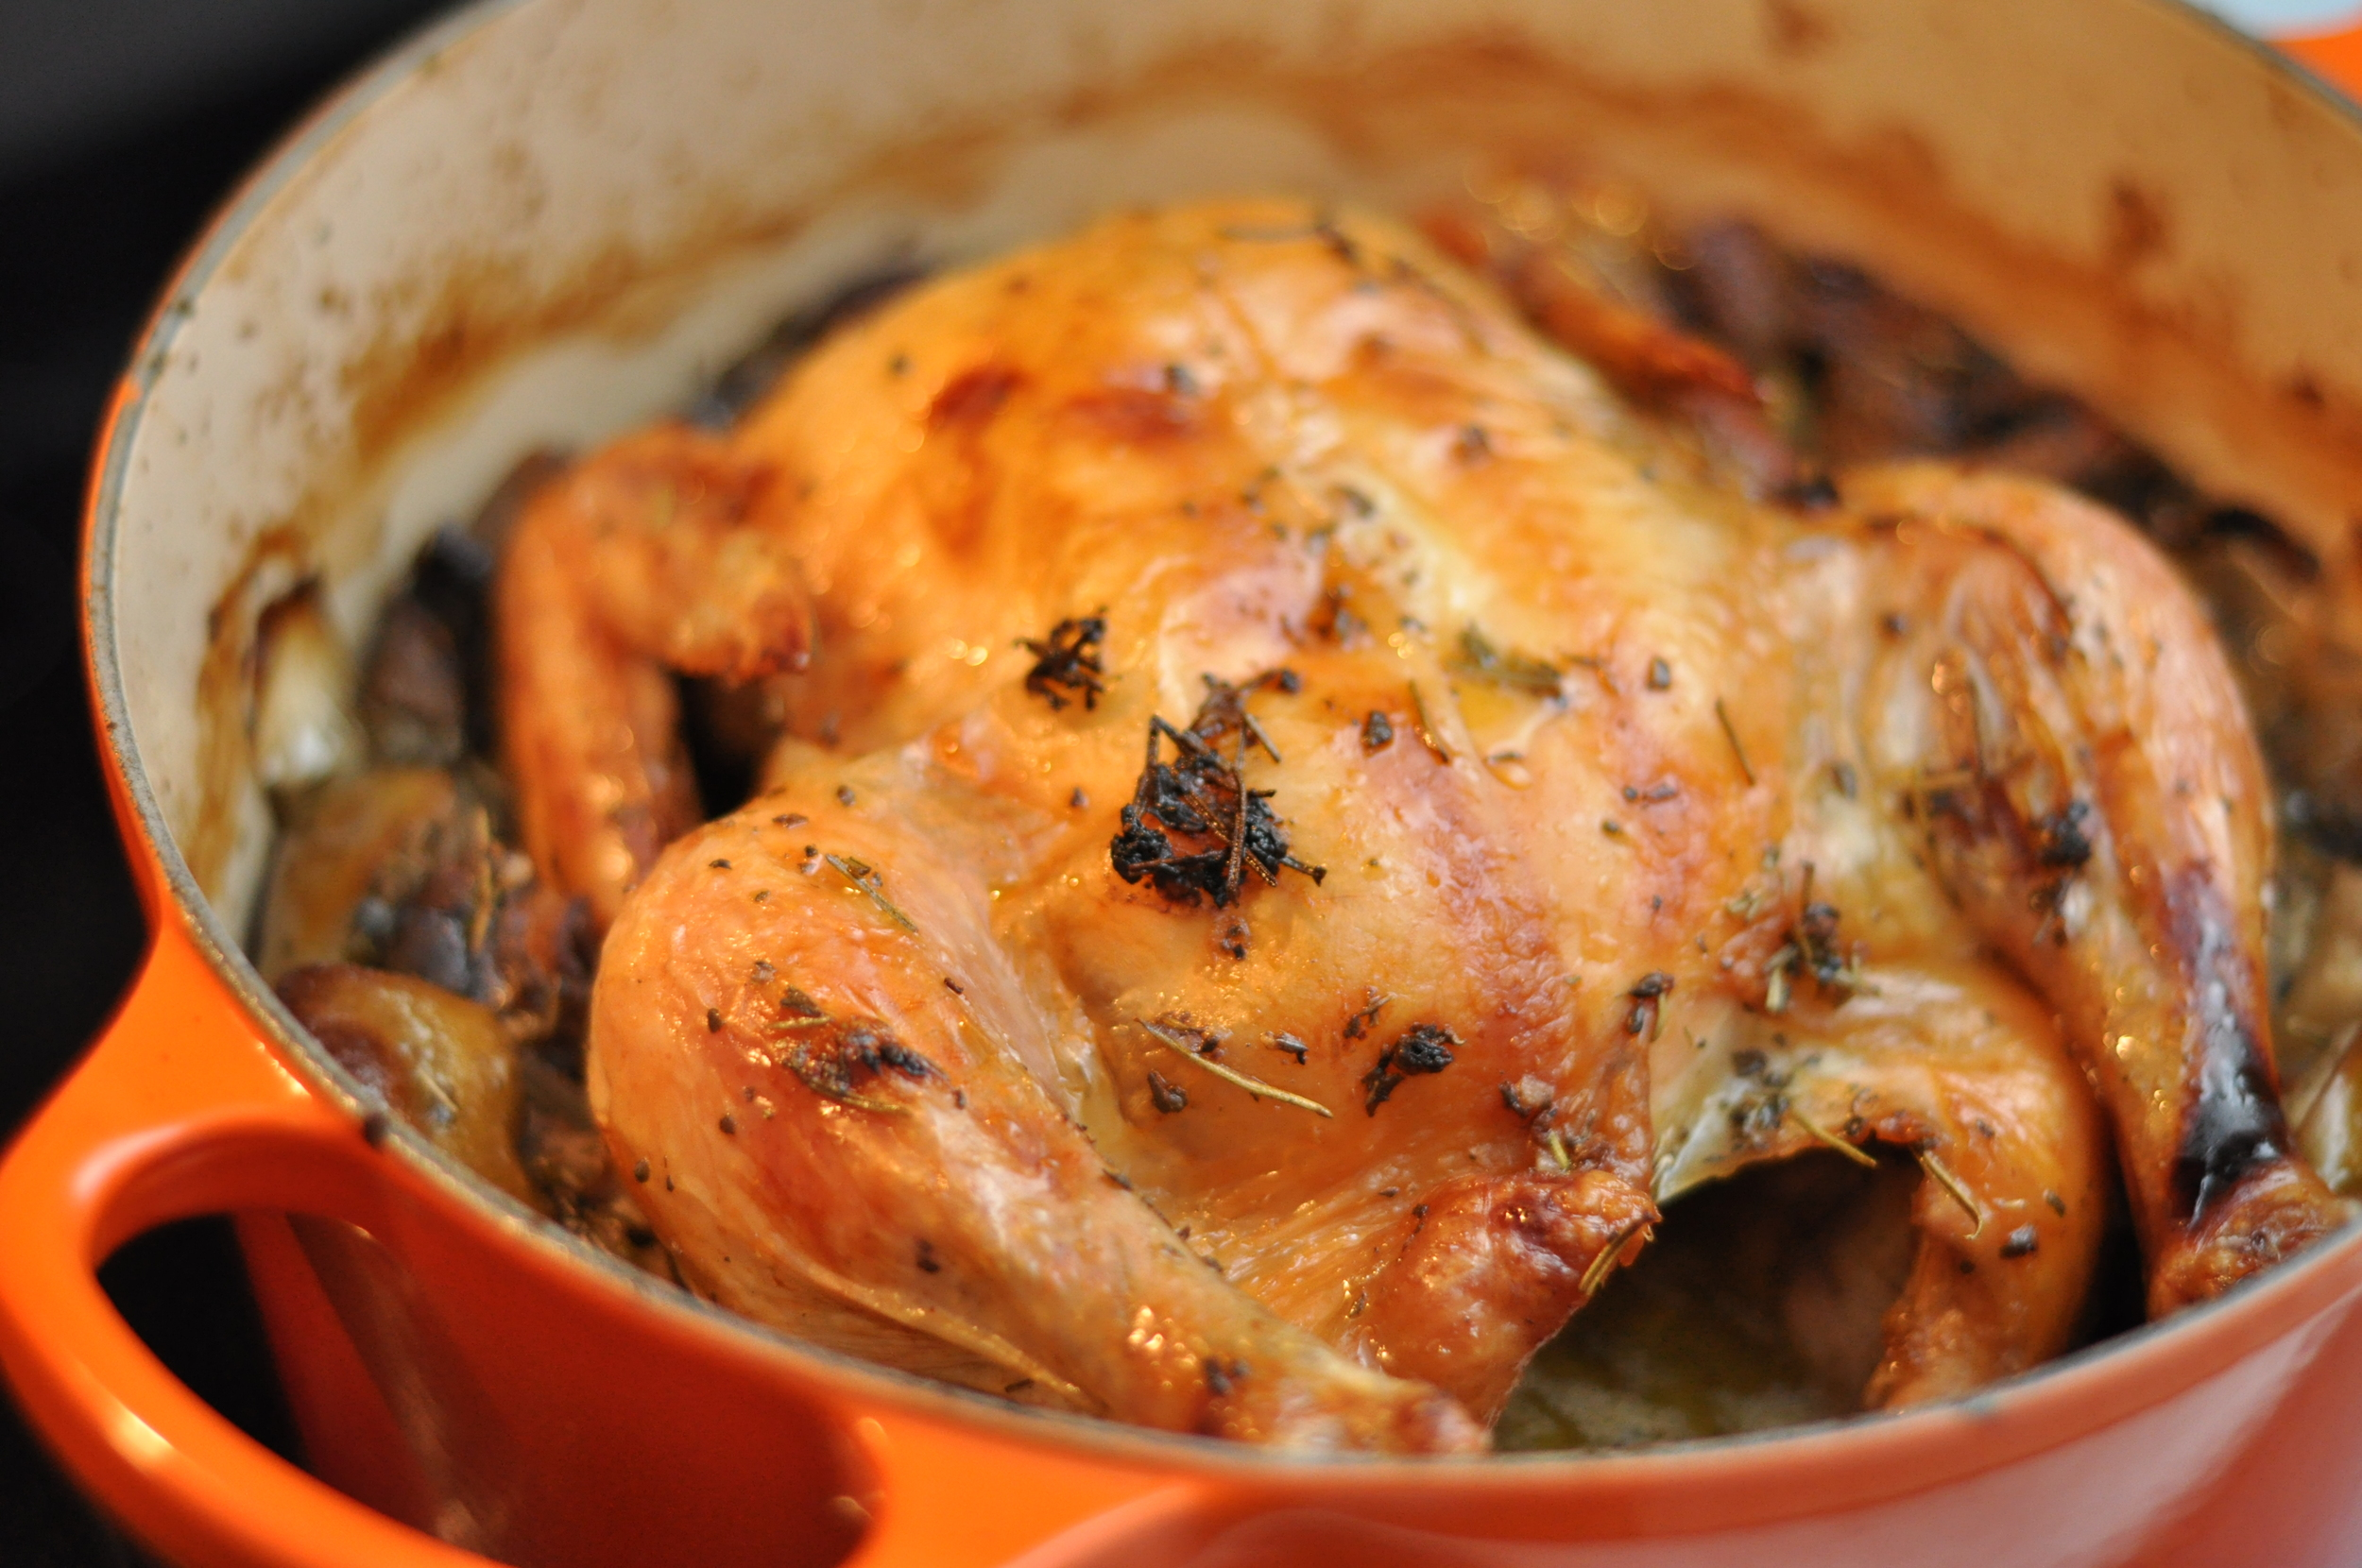 Roast Chicken with Apples, Onion, Mushrooms. Saltandtwine.wordpress.com